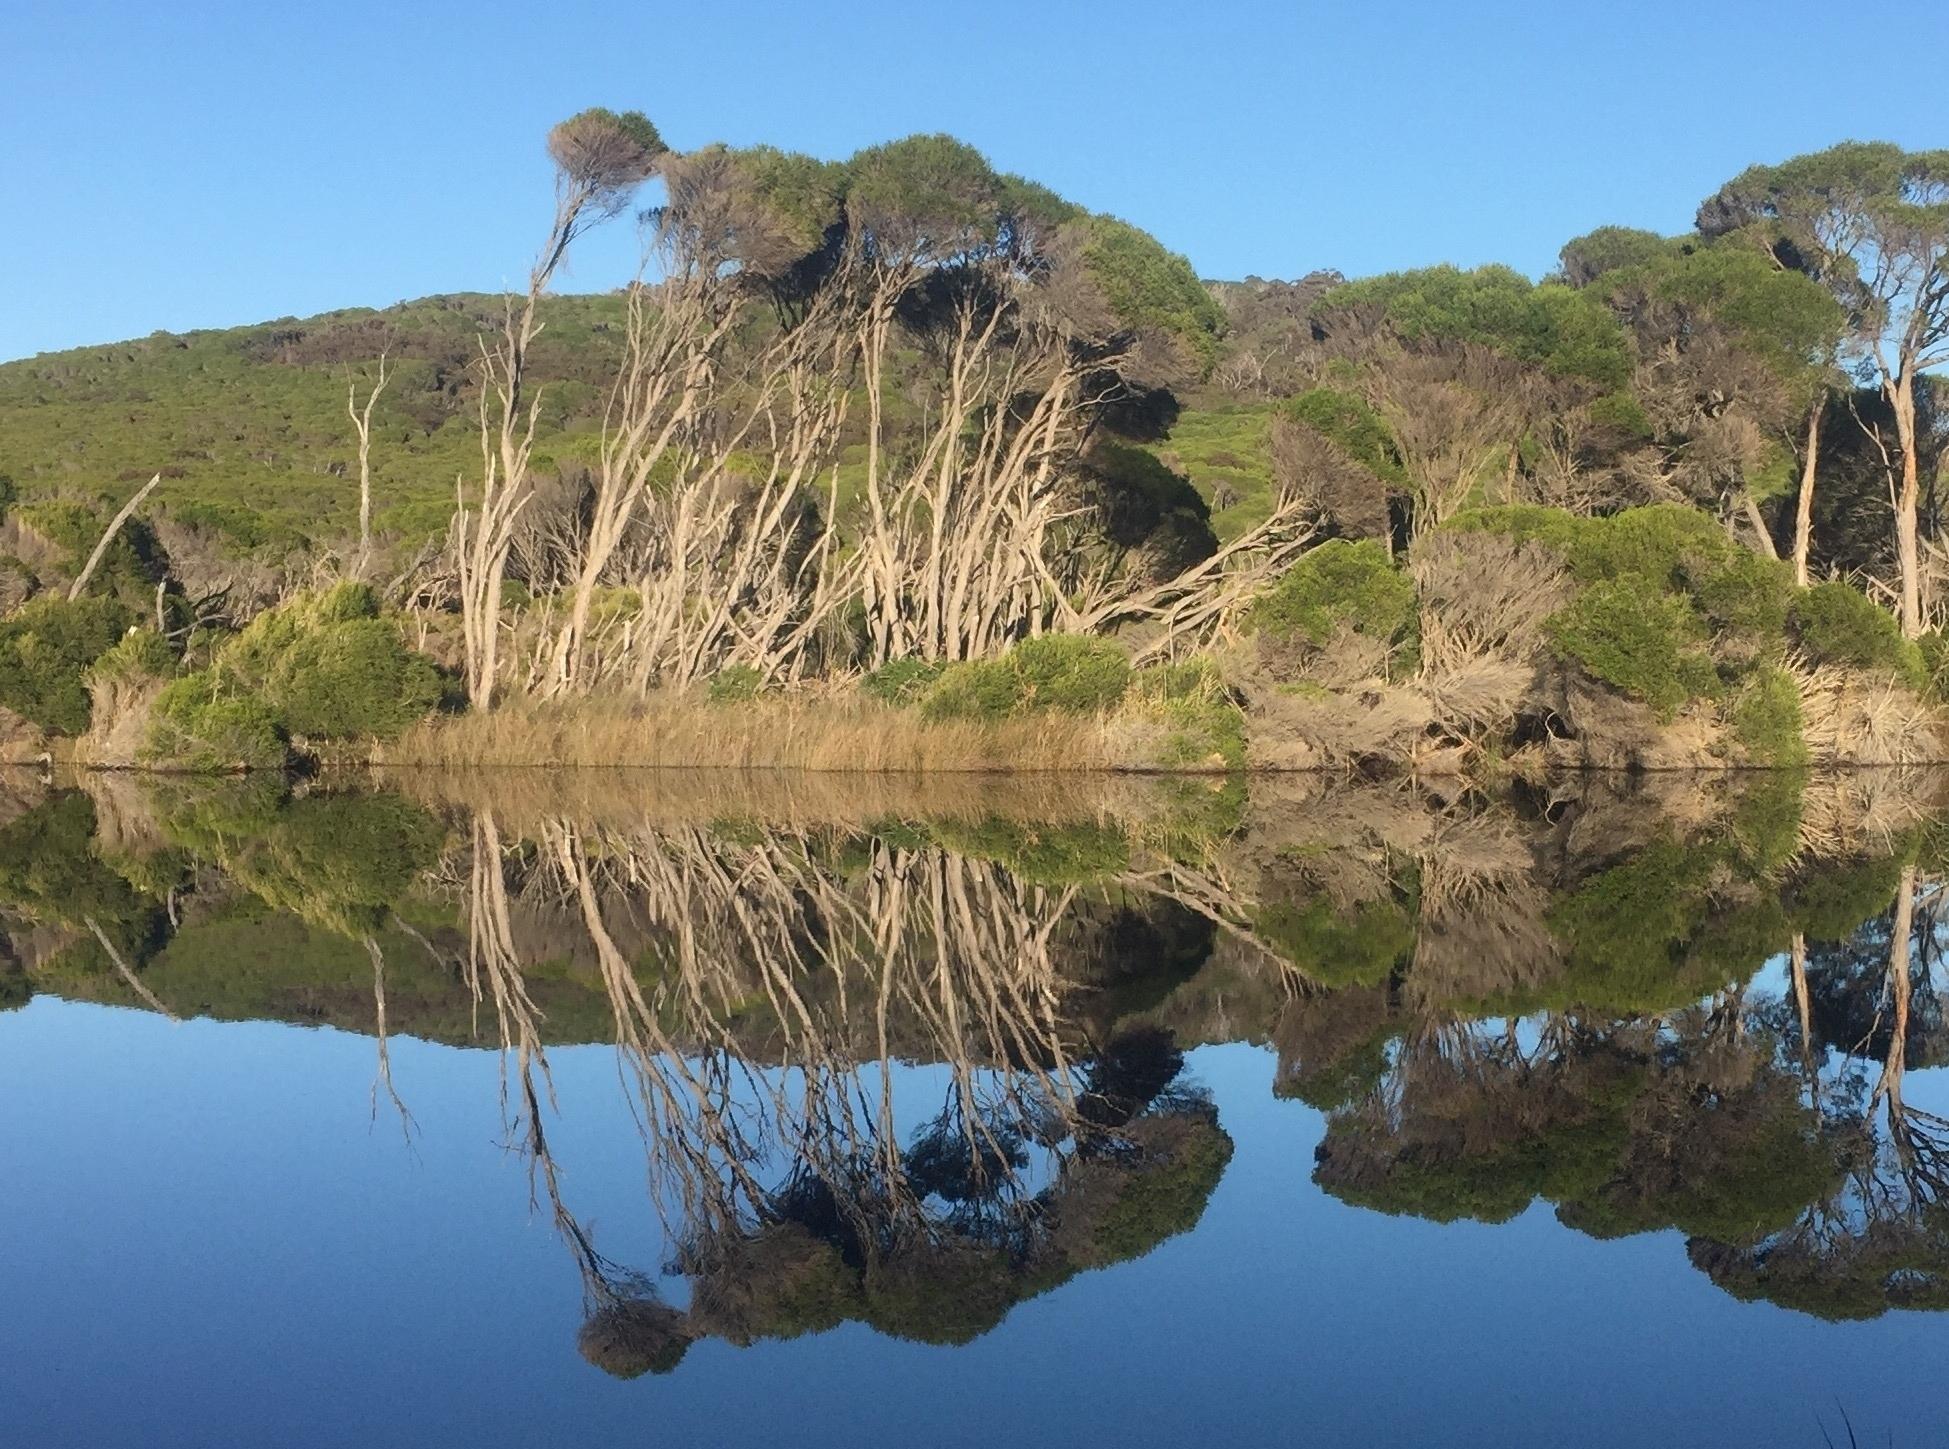 Bournda lagoon - reflection